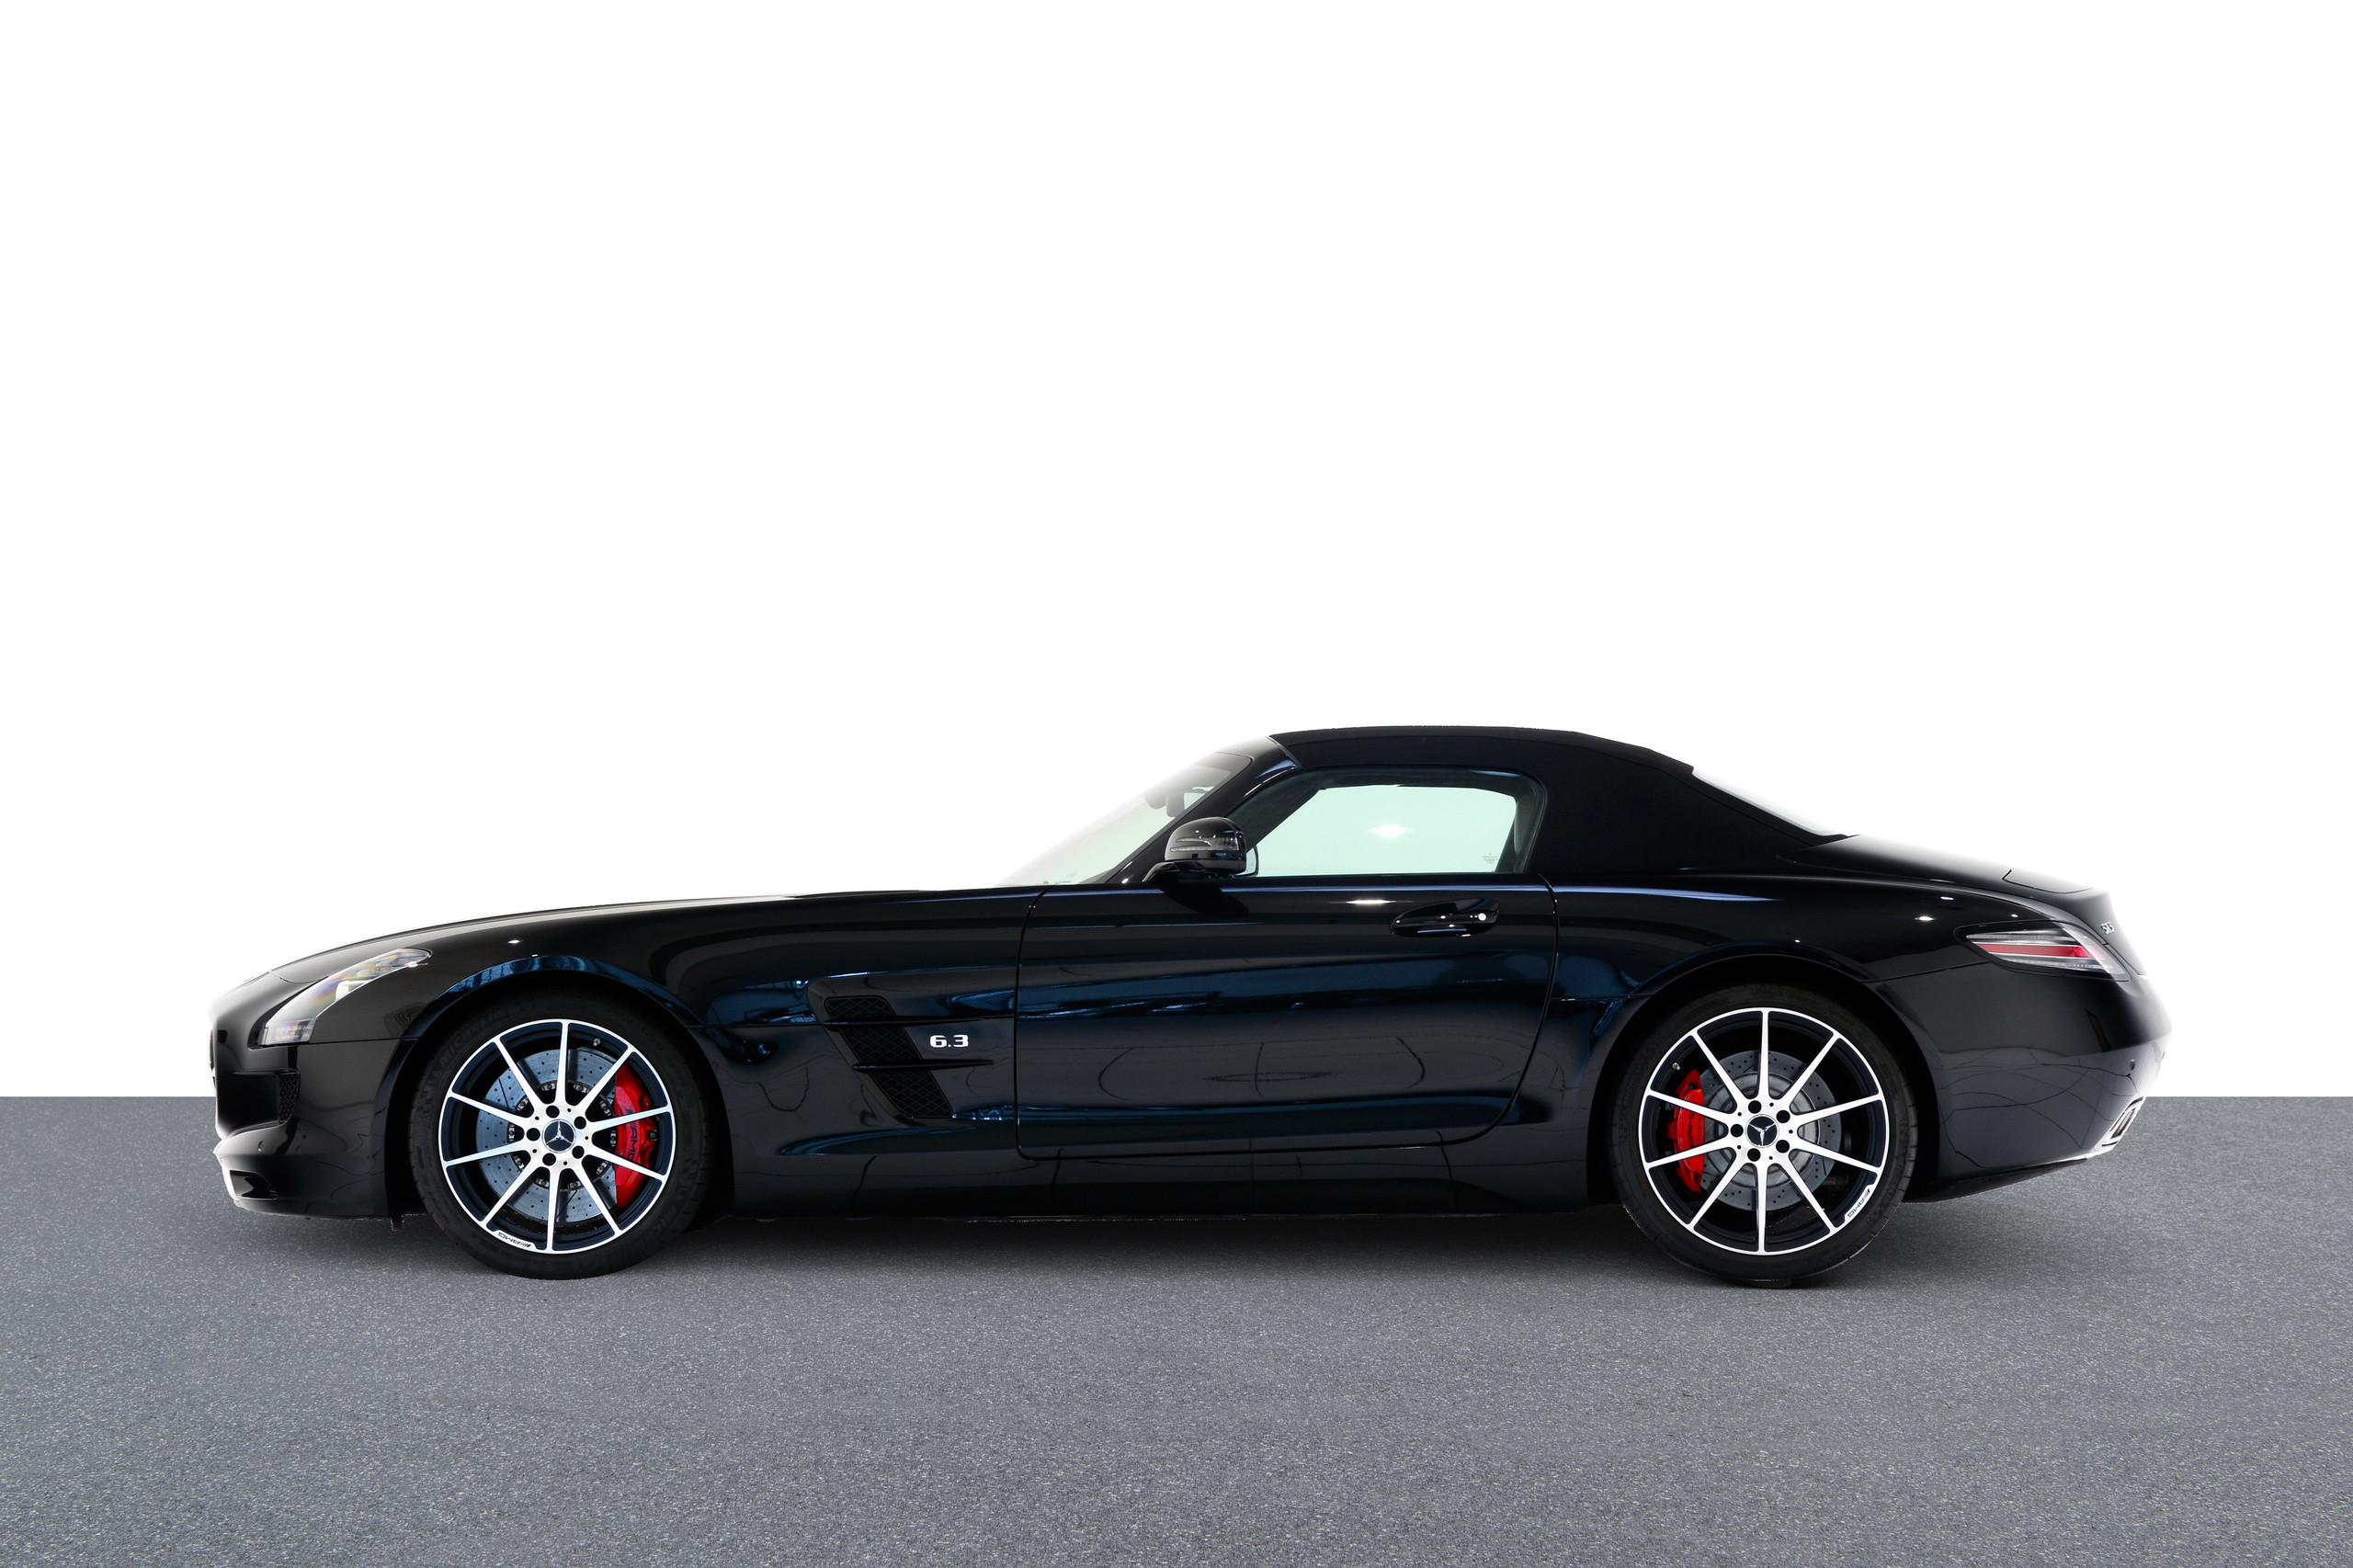 Mercedes-Benz SLS AMG Roadster GT